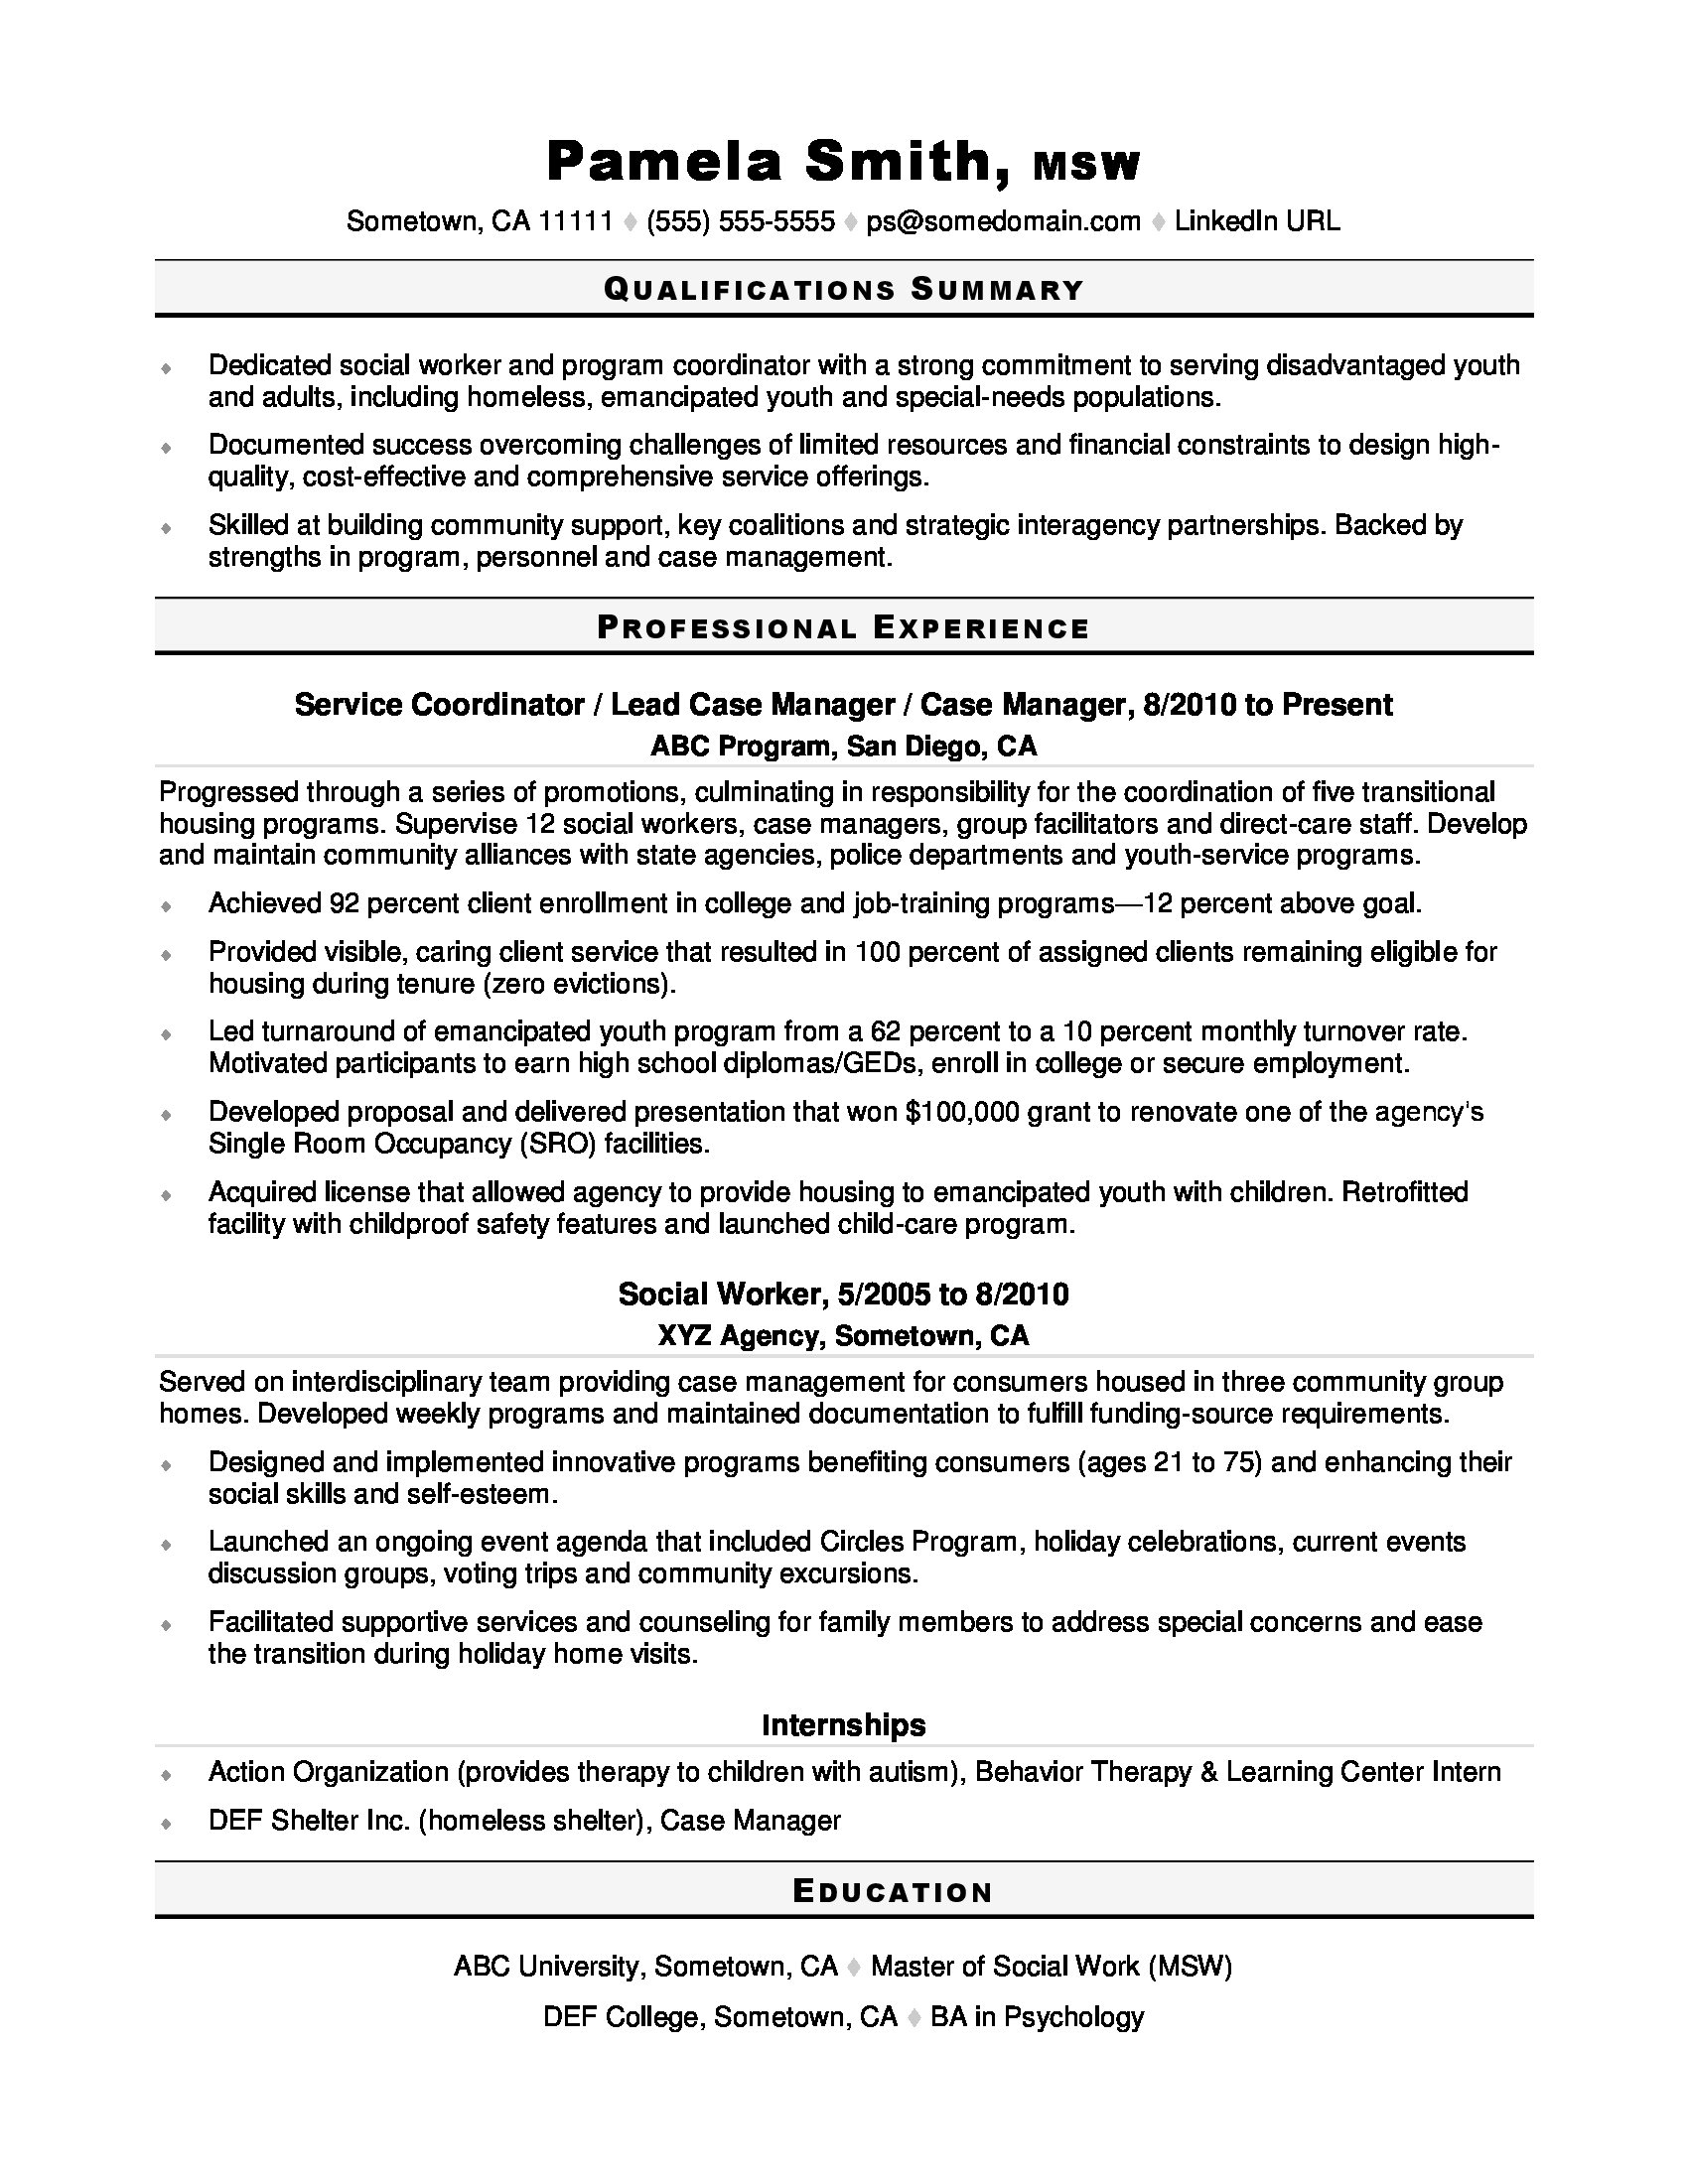 Social Worker Resume Sample